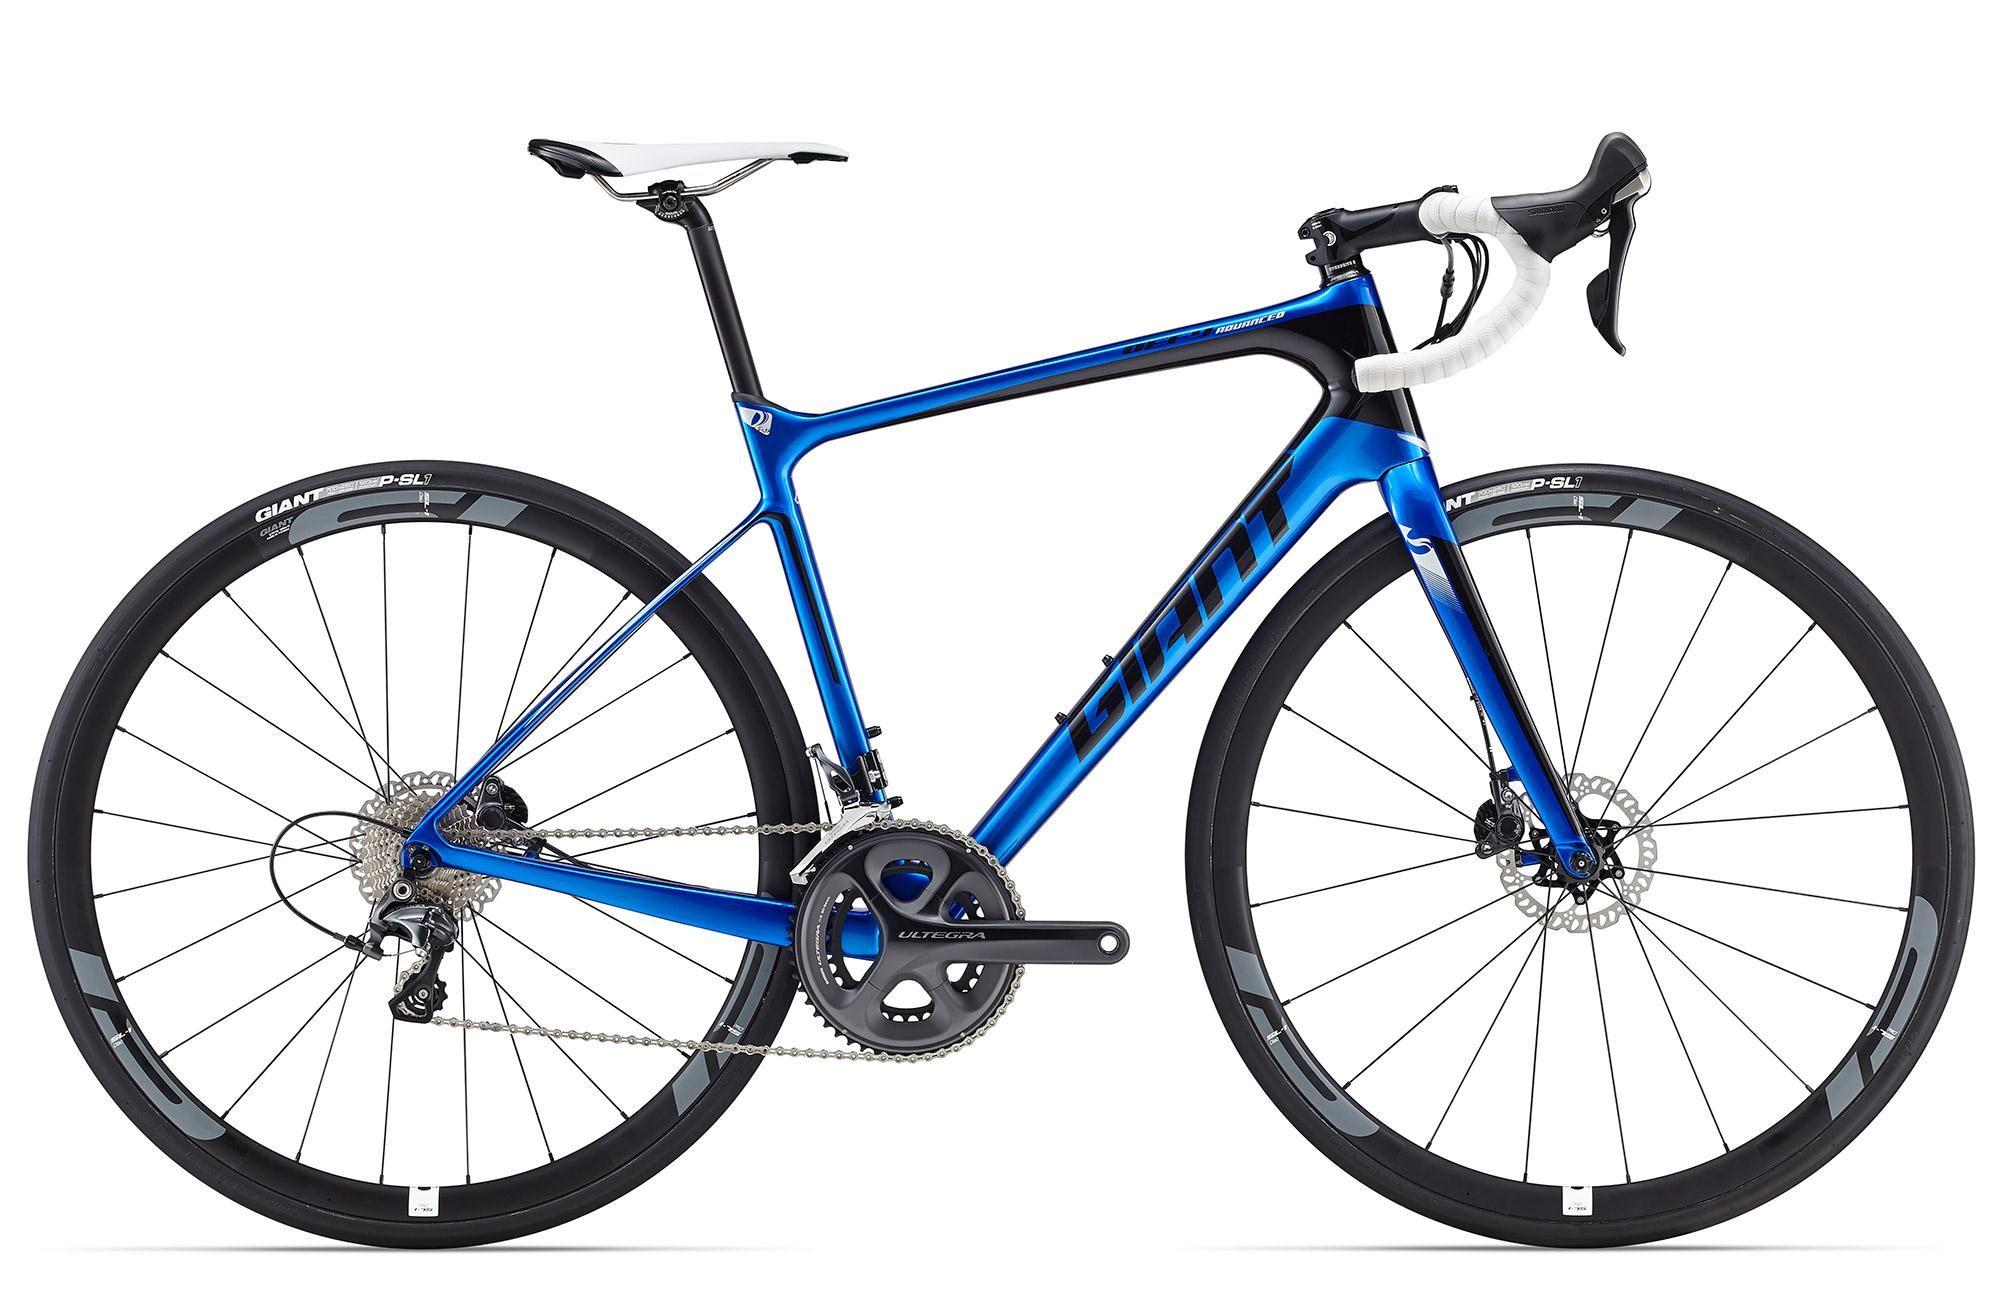 Defy Advanced Pro 2 2016 Giant Bicycles Australia Bike